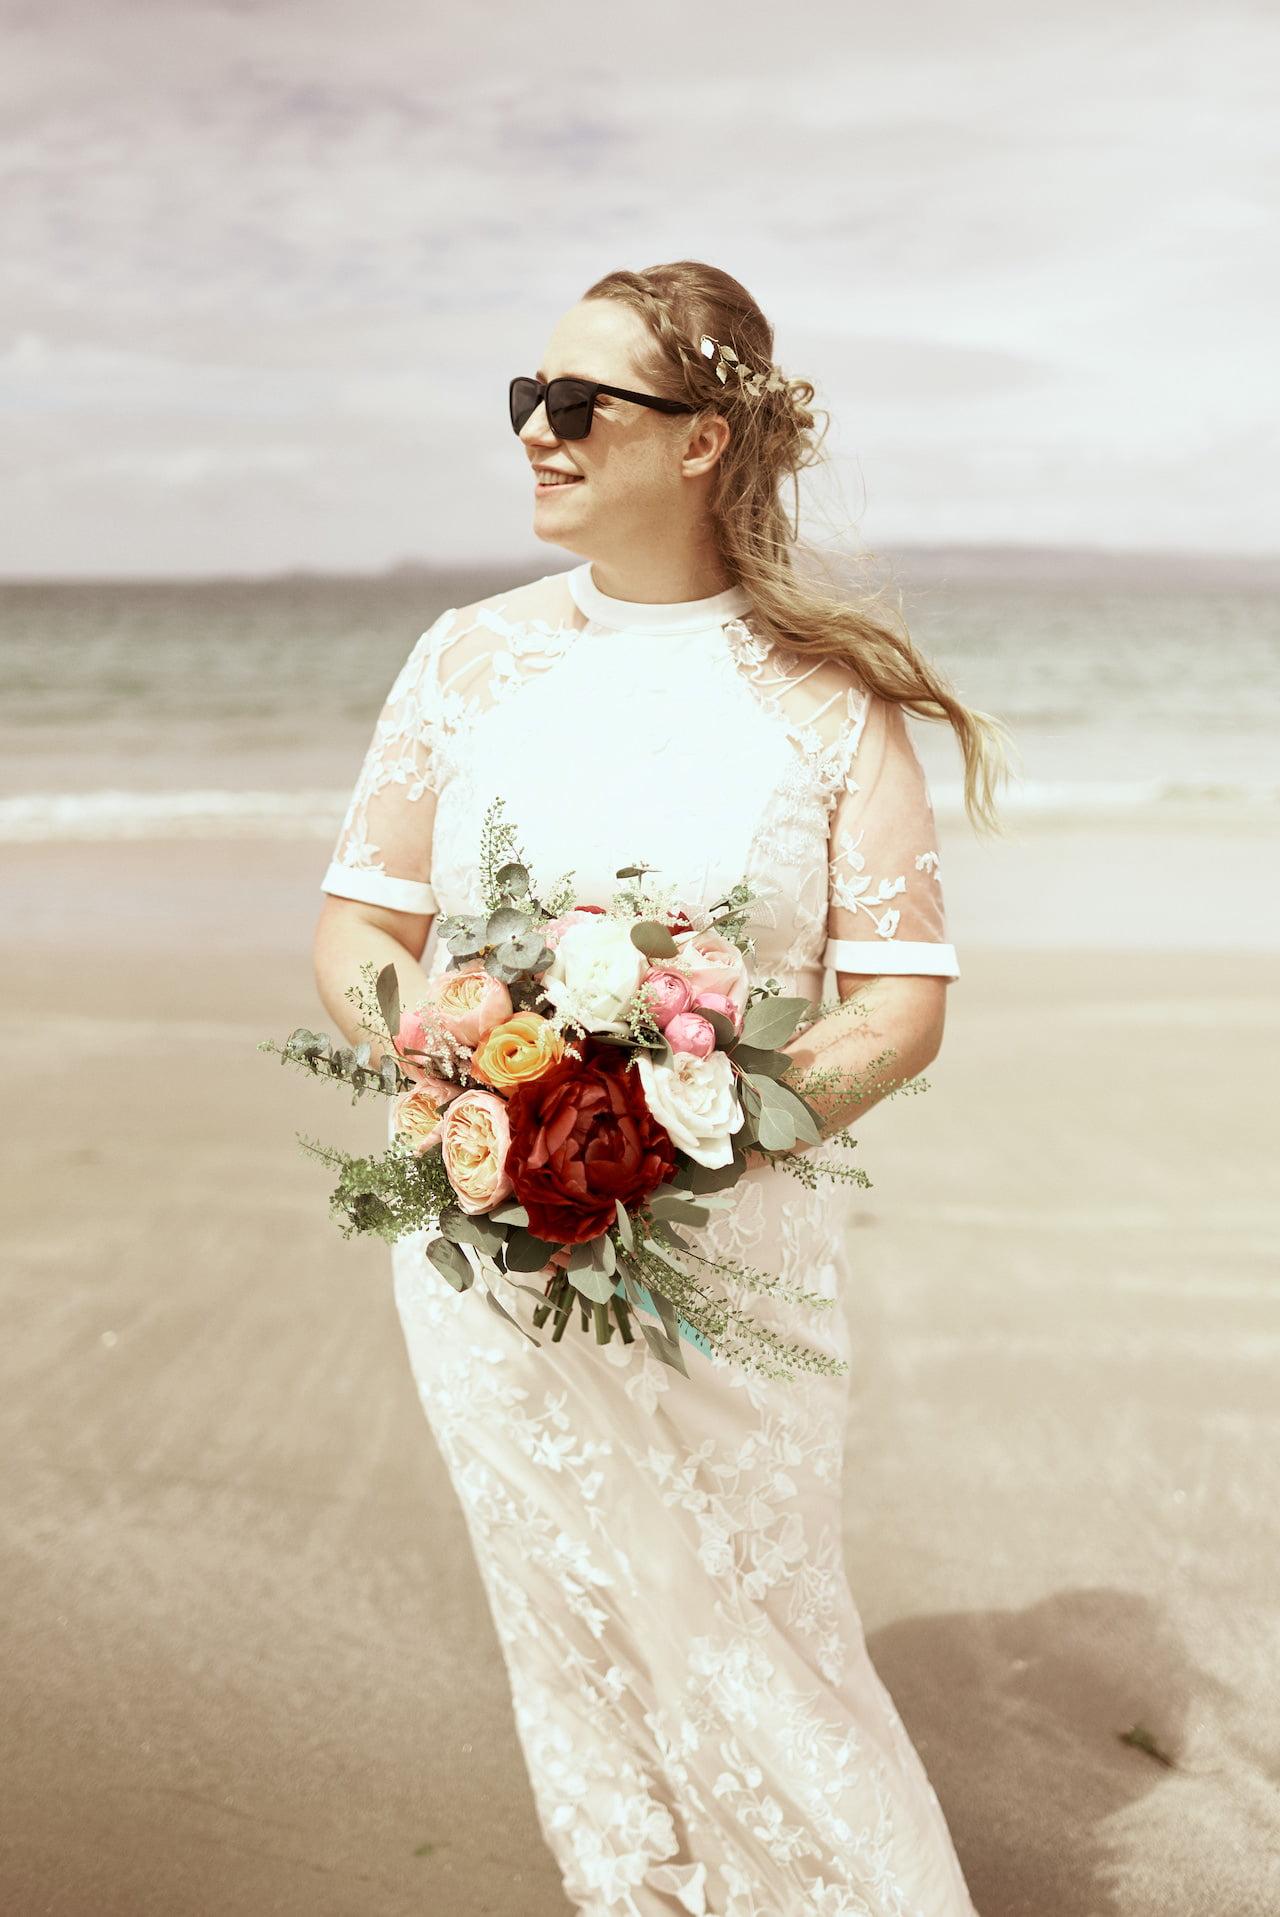 camusdarach beach wedding 04